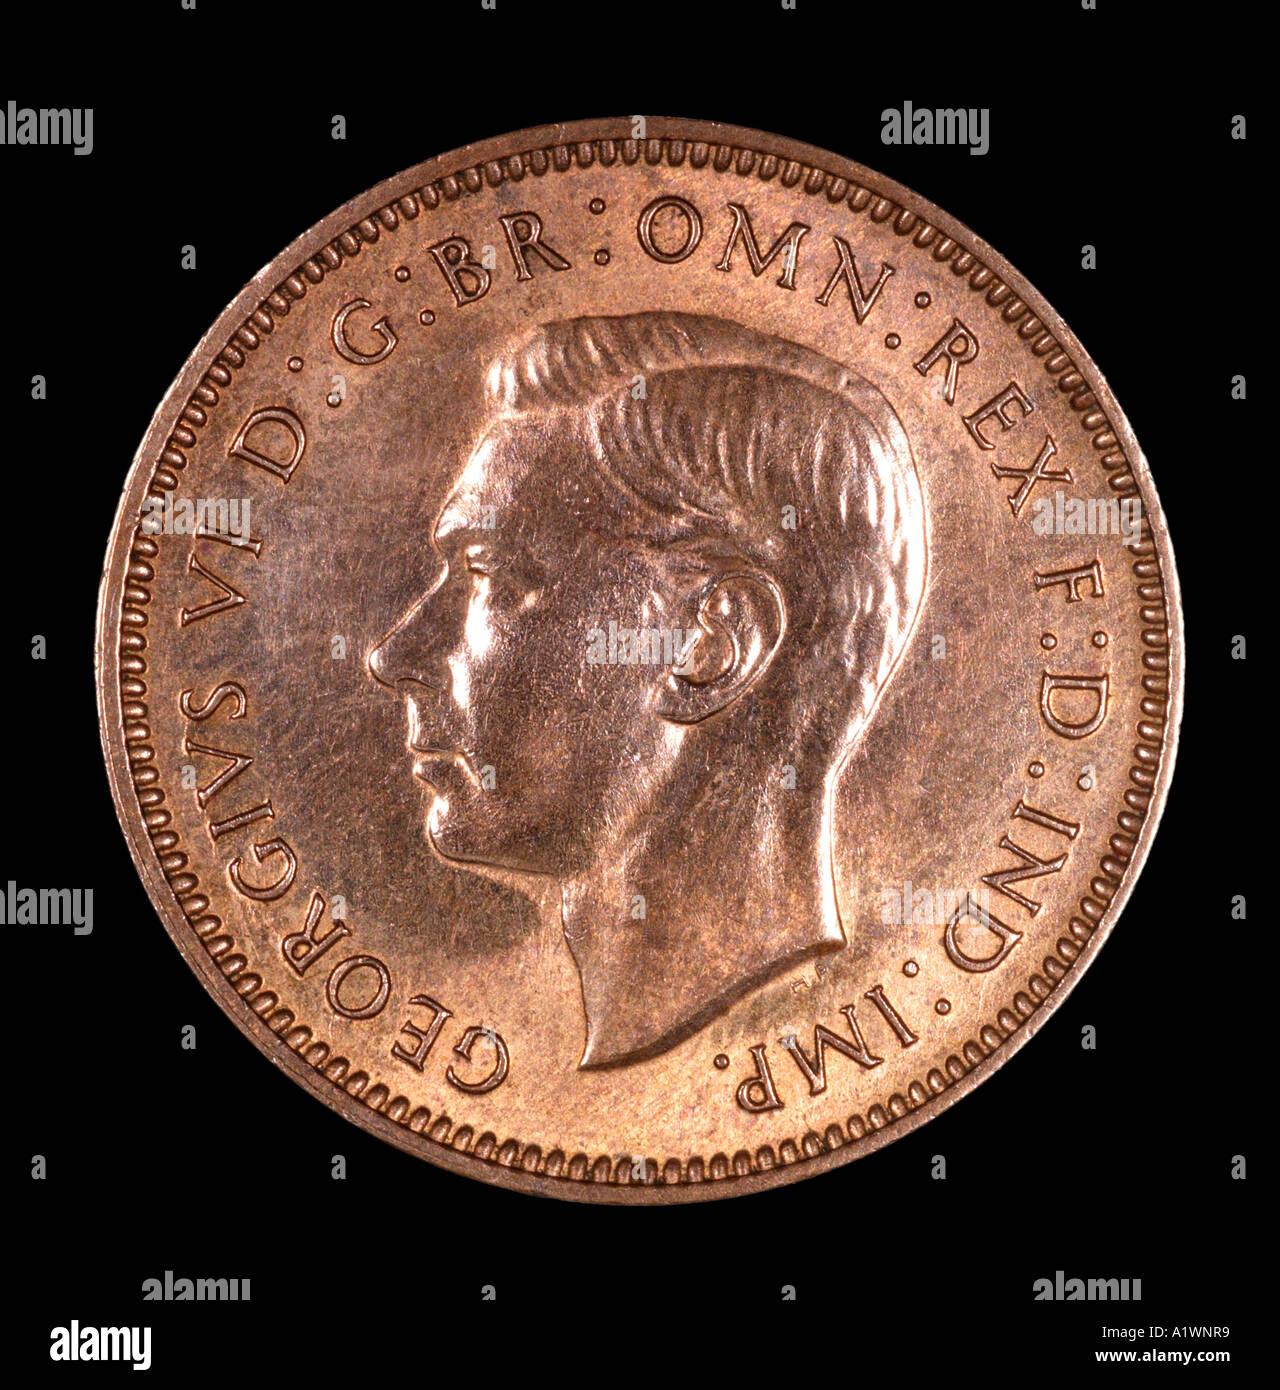 King George VI Reg fid def pre decimal quarter farthing penny old